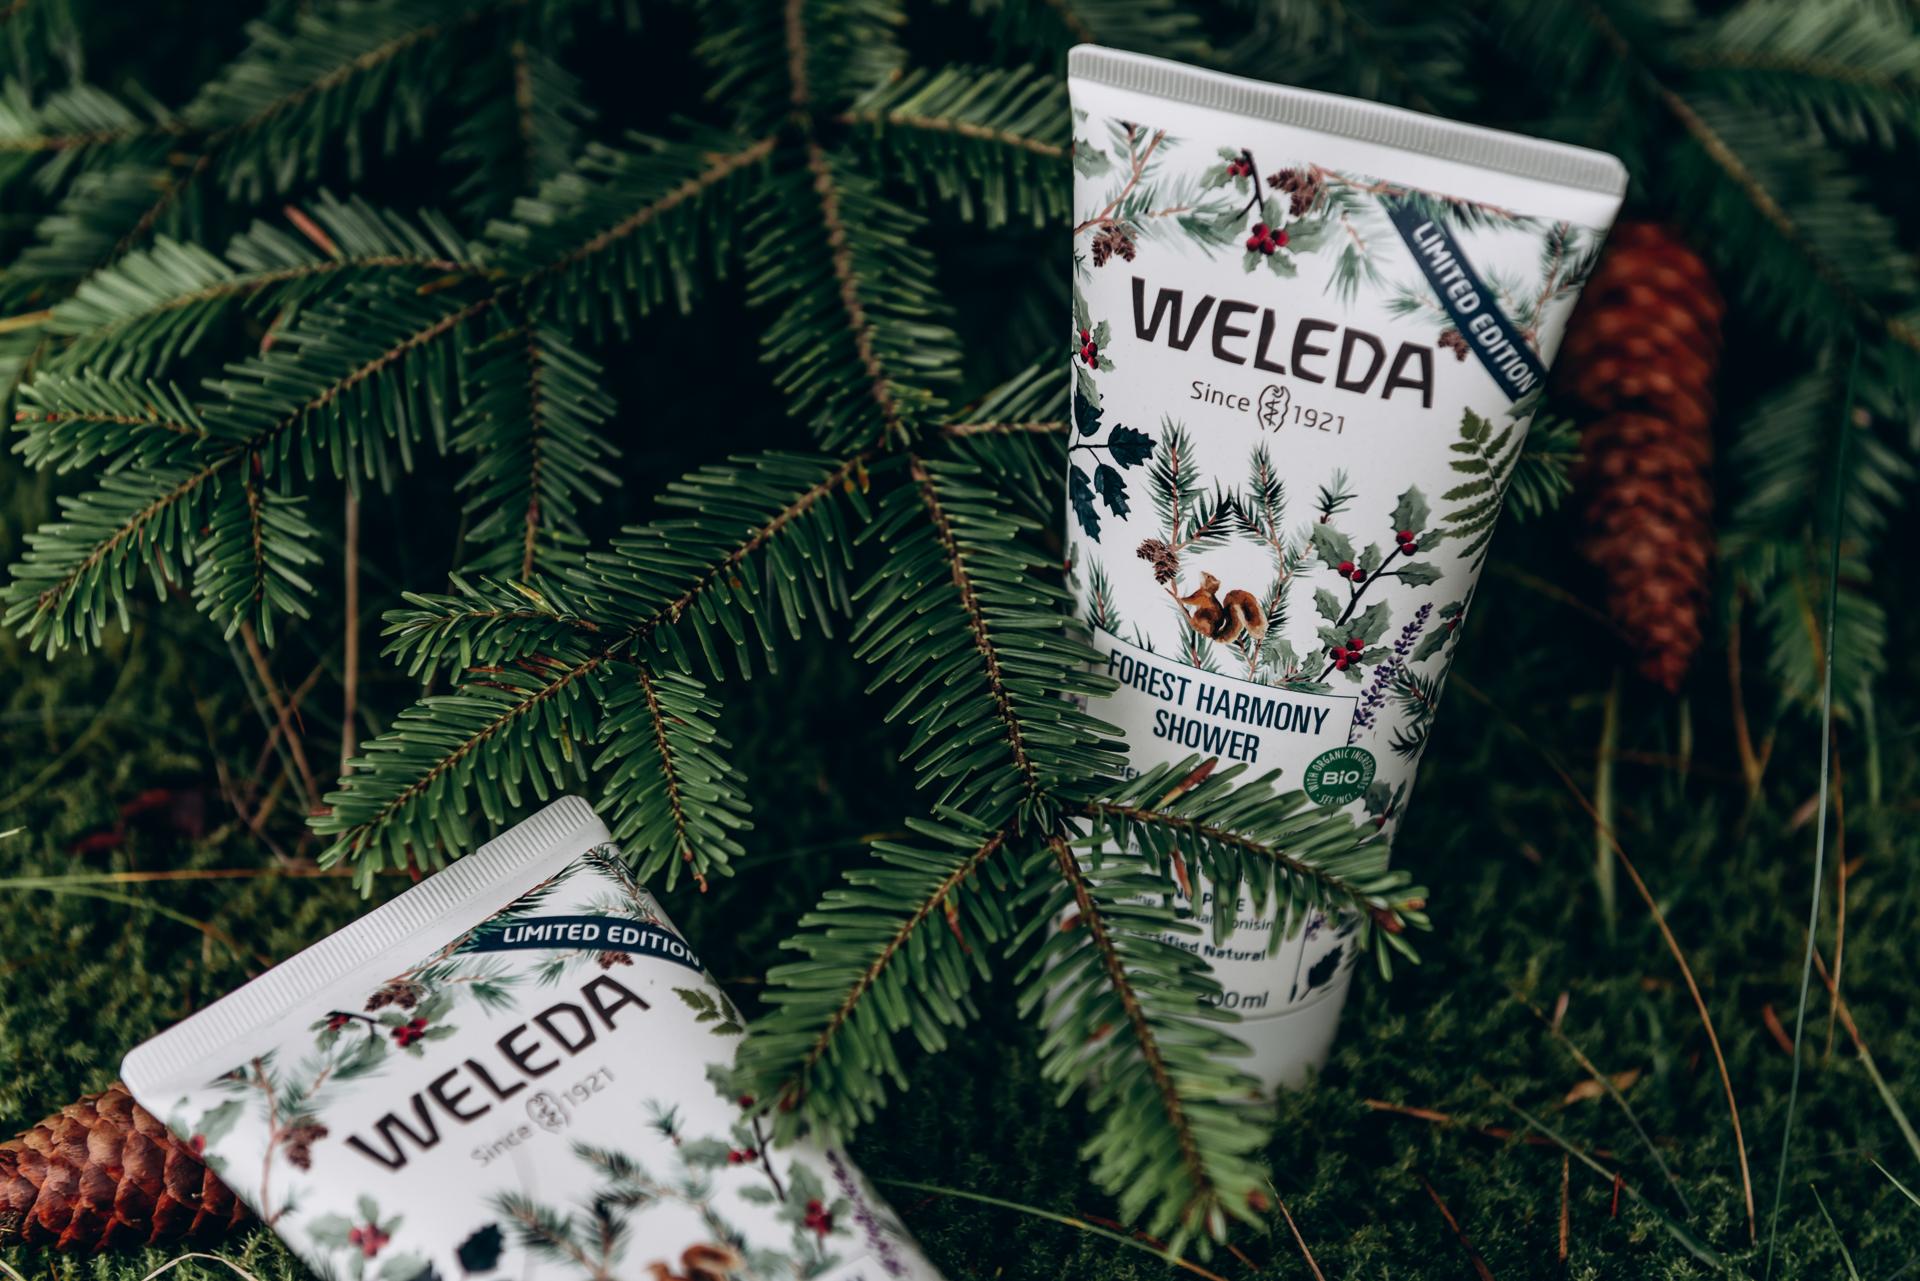 Weleda Forest Harmony Shower Cremedusche Waldbaden